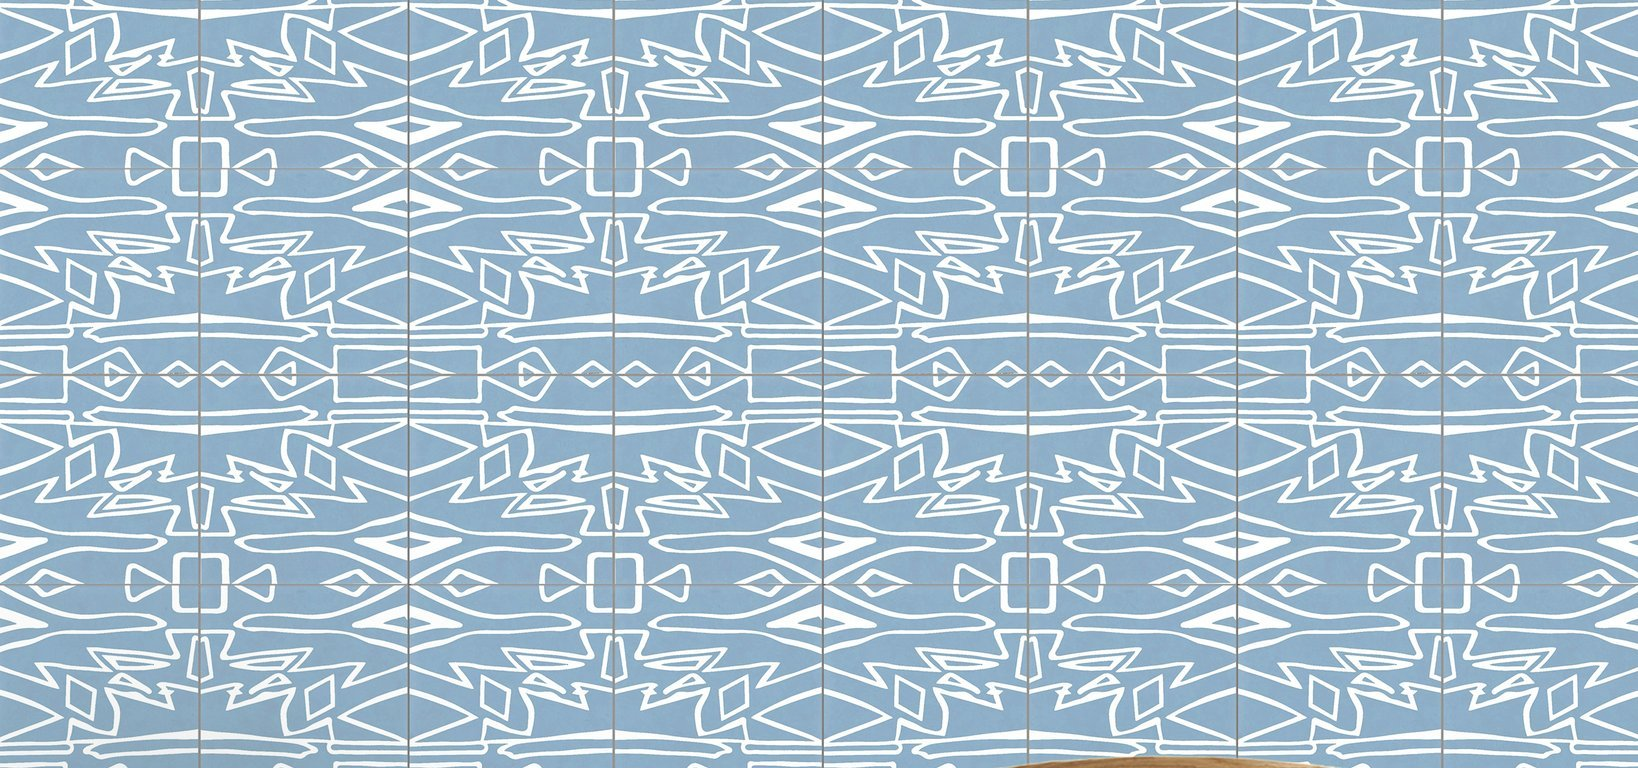 Cle Tiles design Eskayel - Akimbo